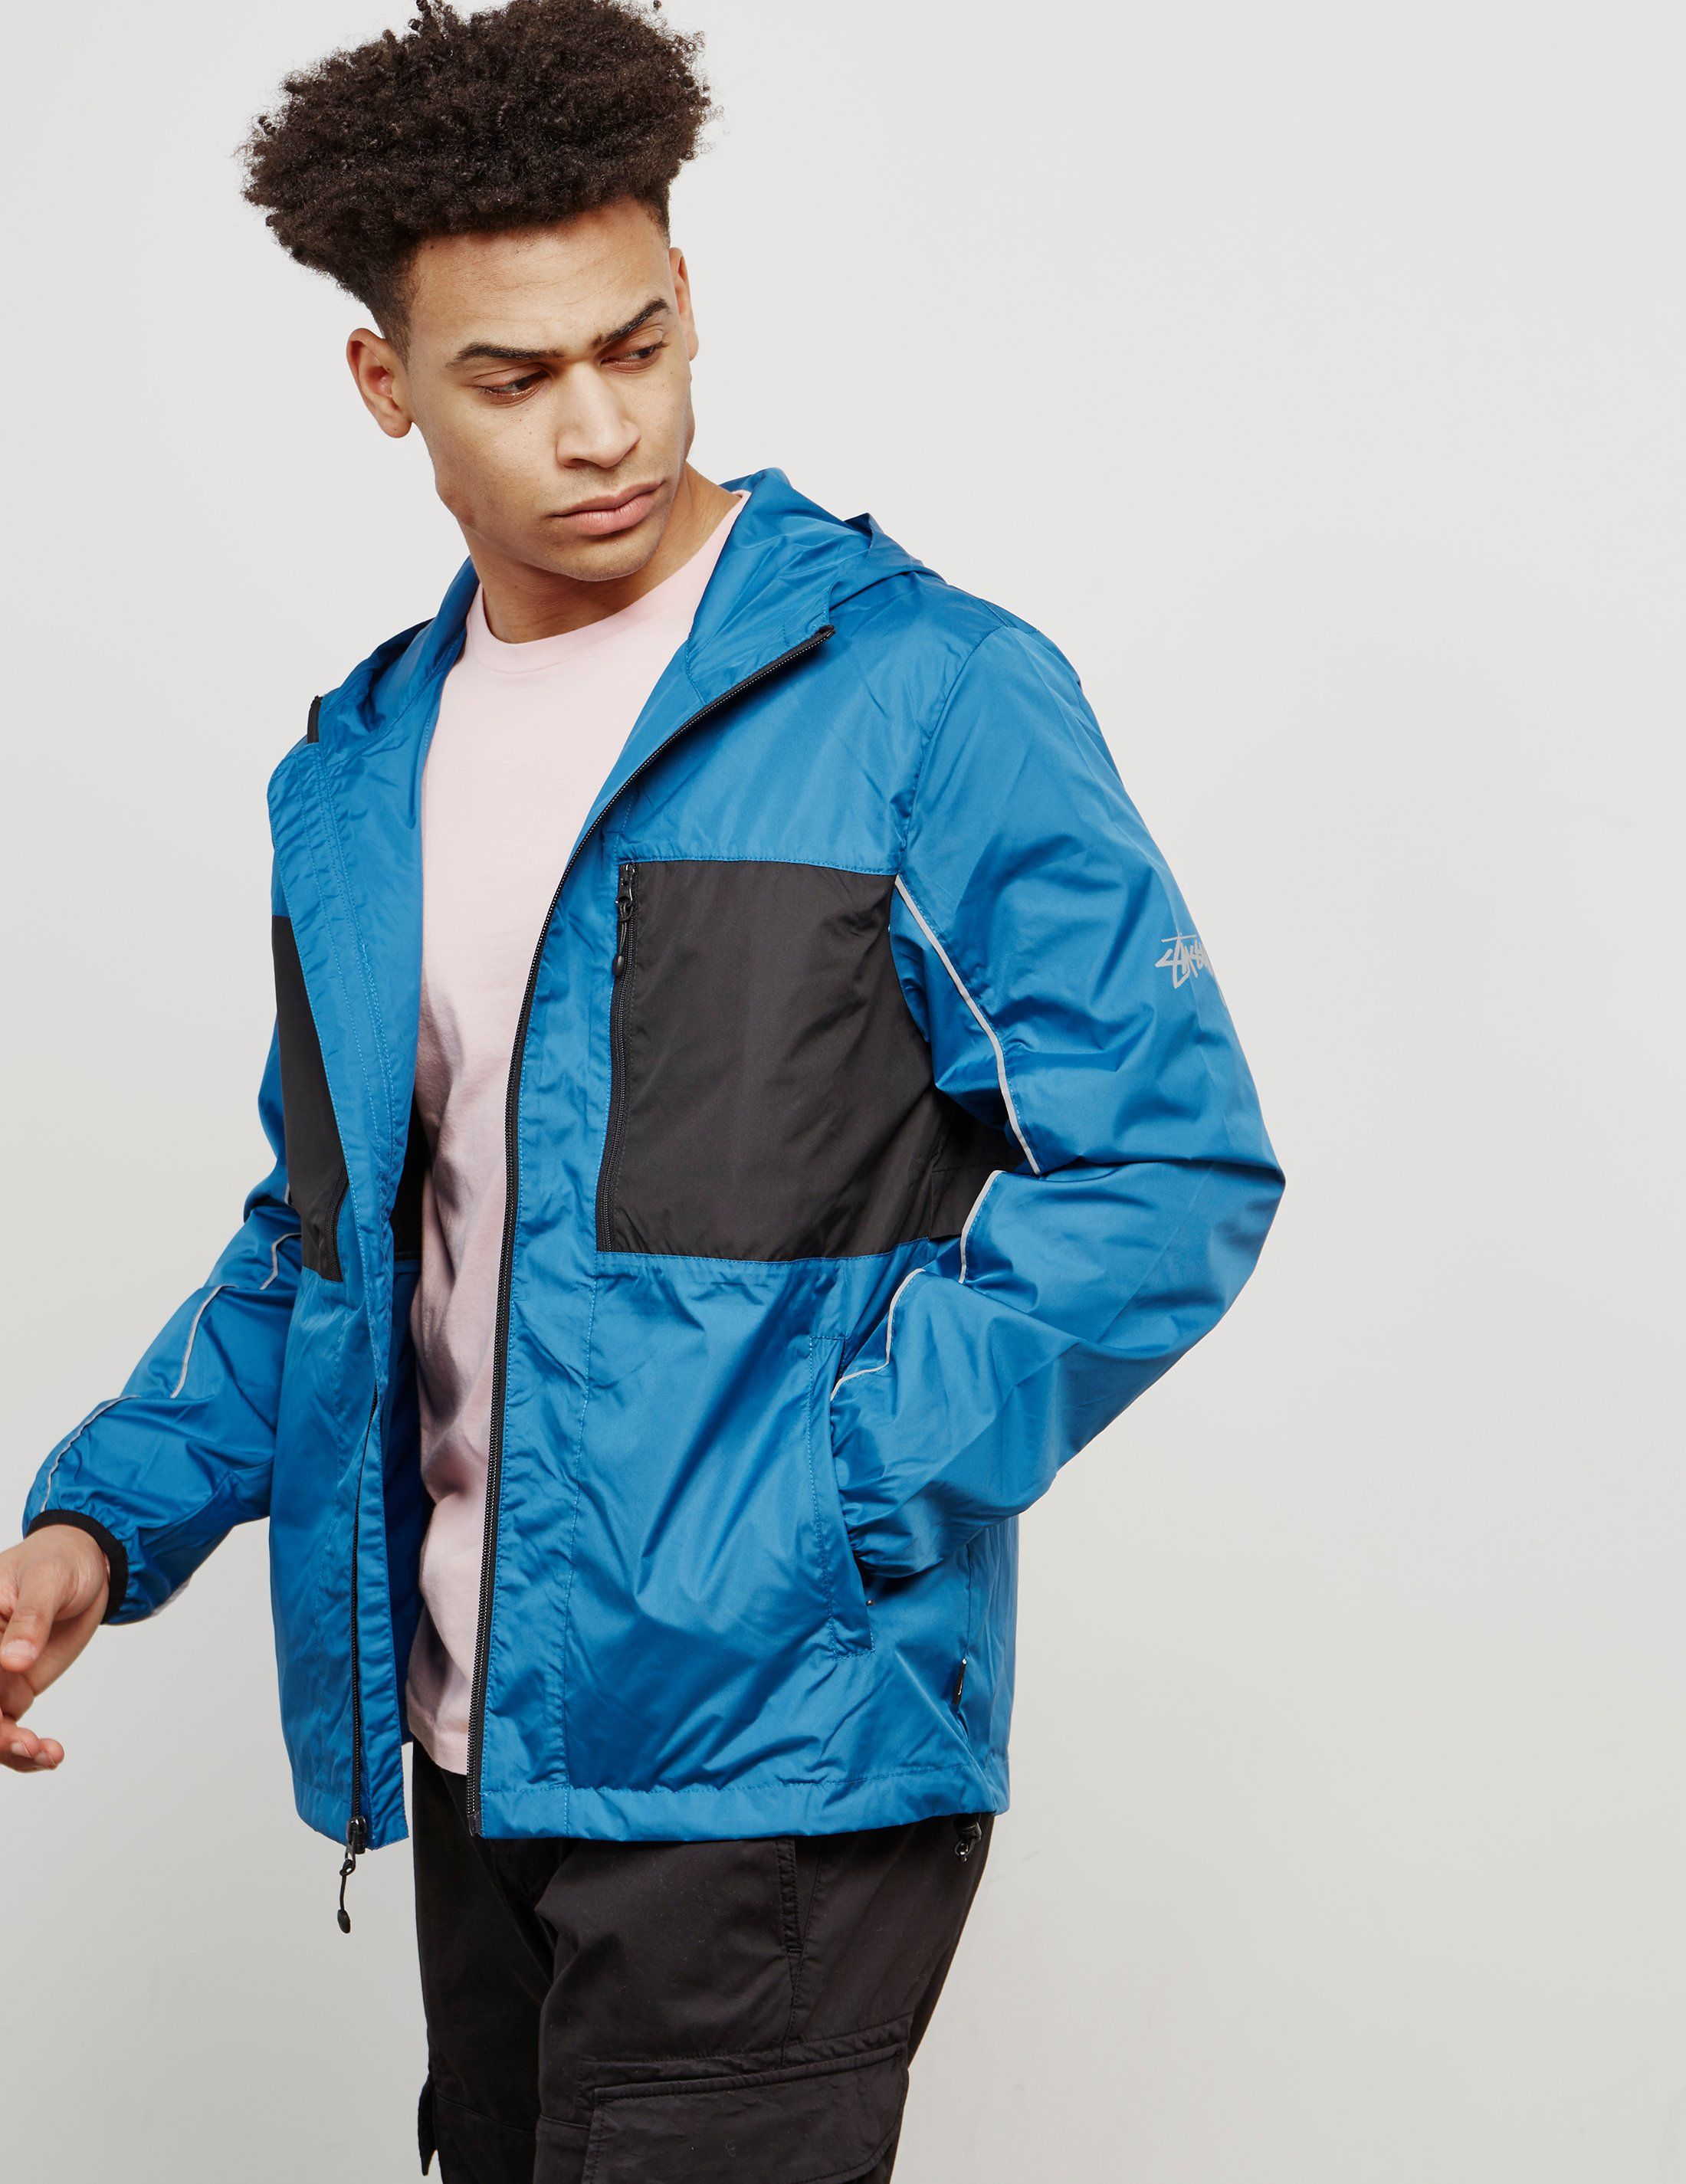 Stussy Reflective Lightweight Jacket - Online Exclusive